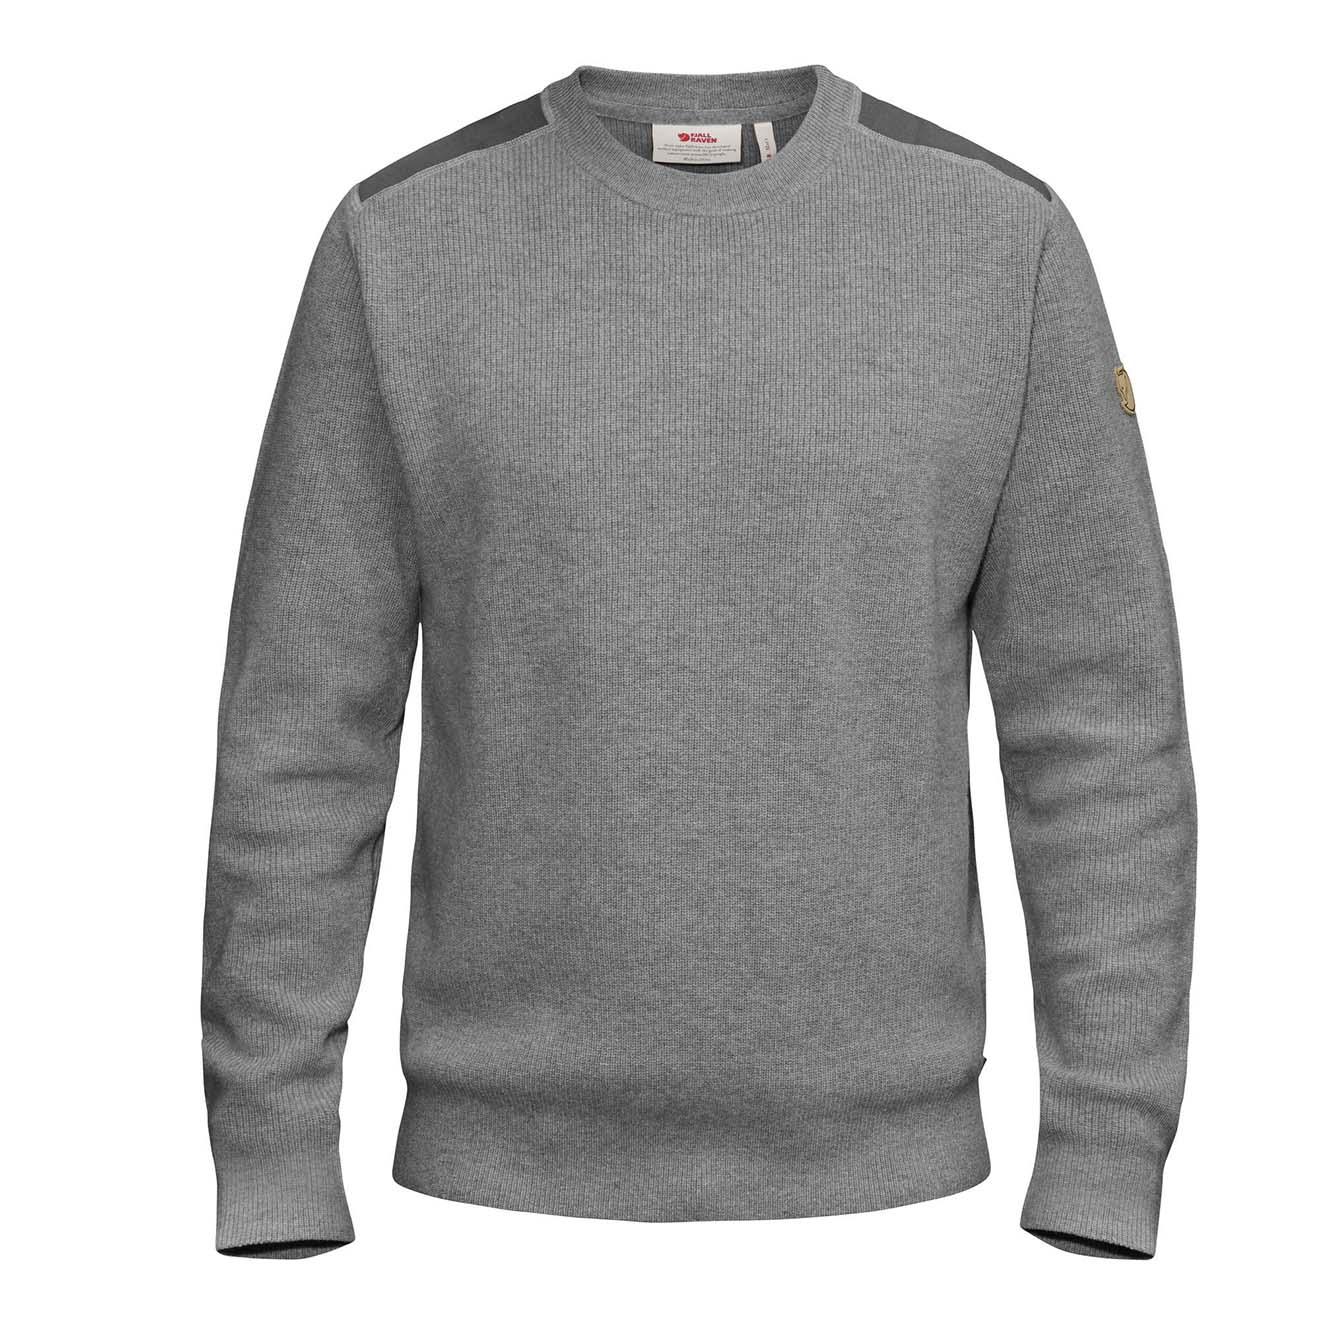 Fjallraven Sormland Crew Sweater Grey